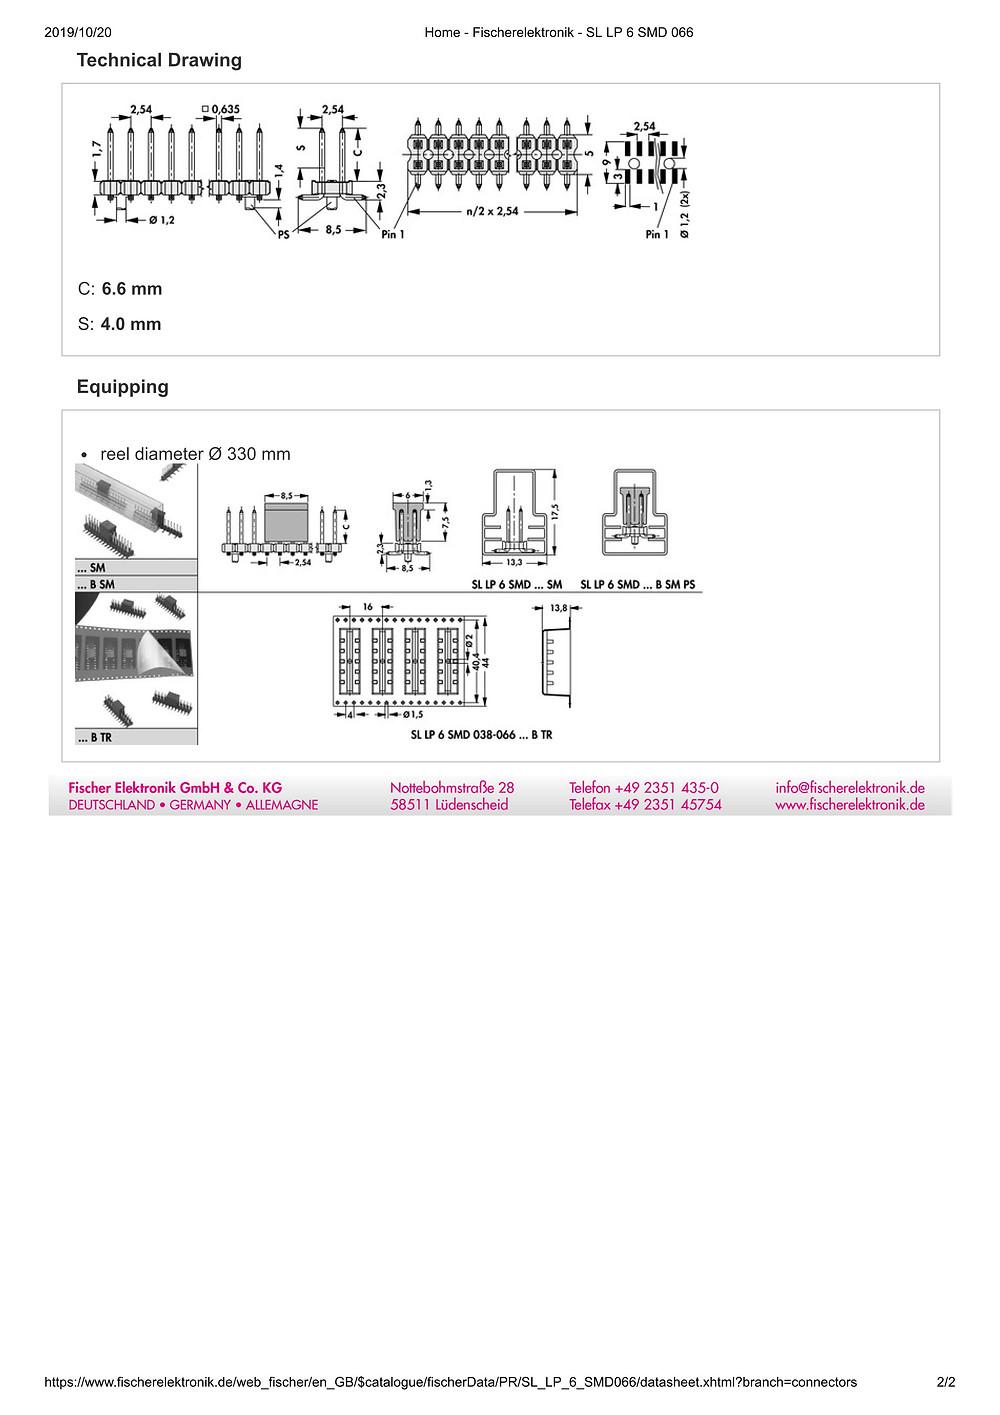 SL LP 6 SMD 066 フィッシャー テープ&リール対応 低背型 ピンヘッダ 2列 2.54㎜ピッチ □0.635mm (1リール=250個巻)4-40ピン